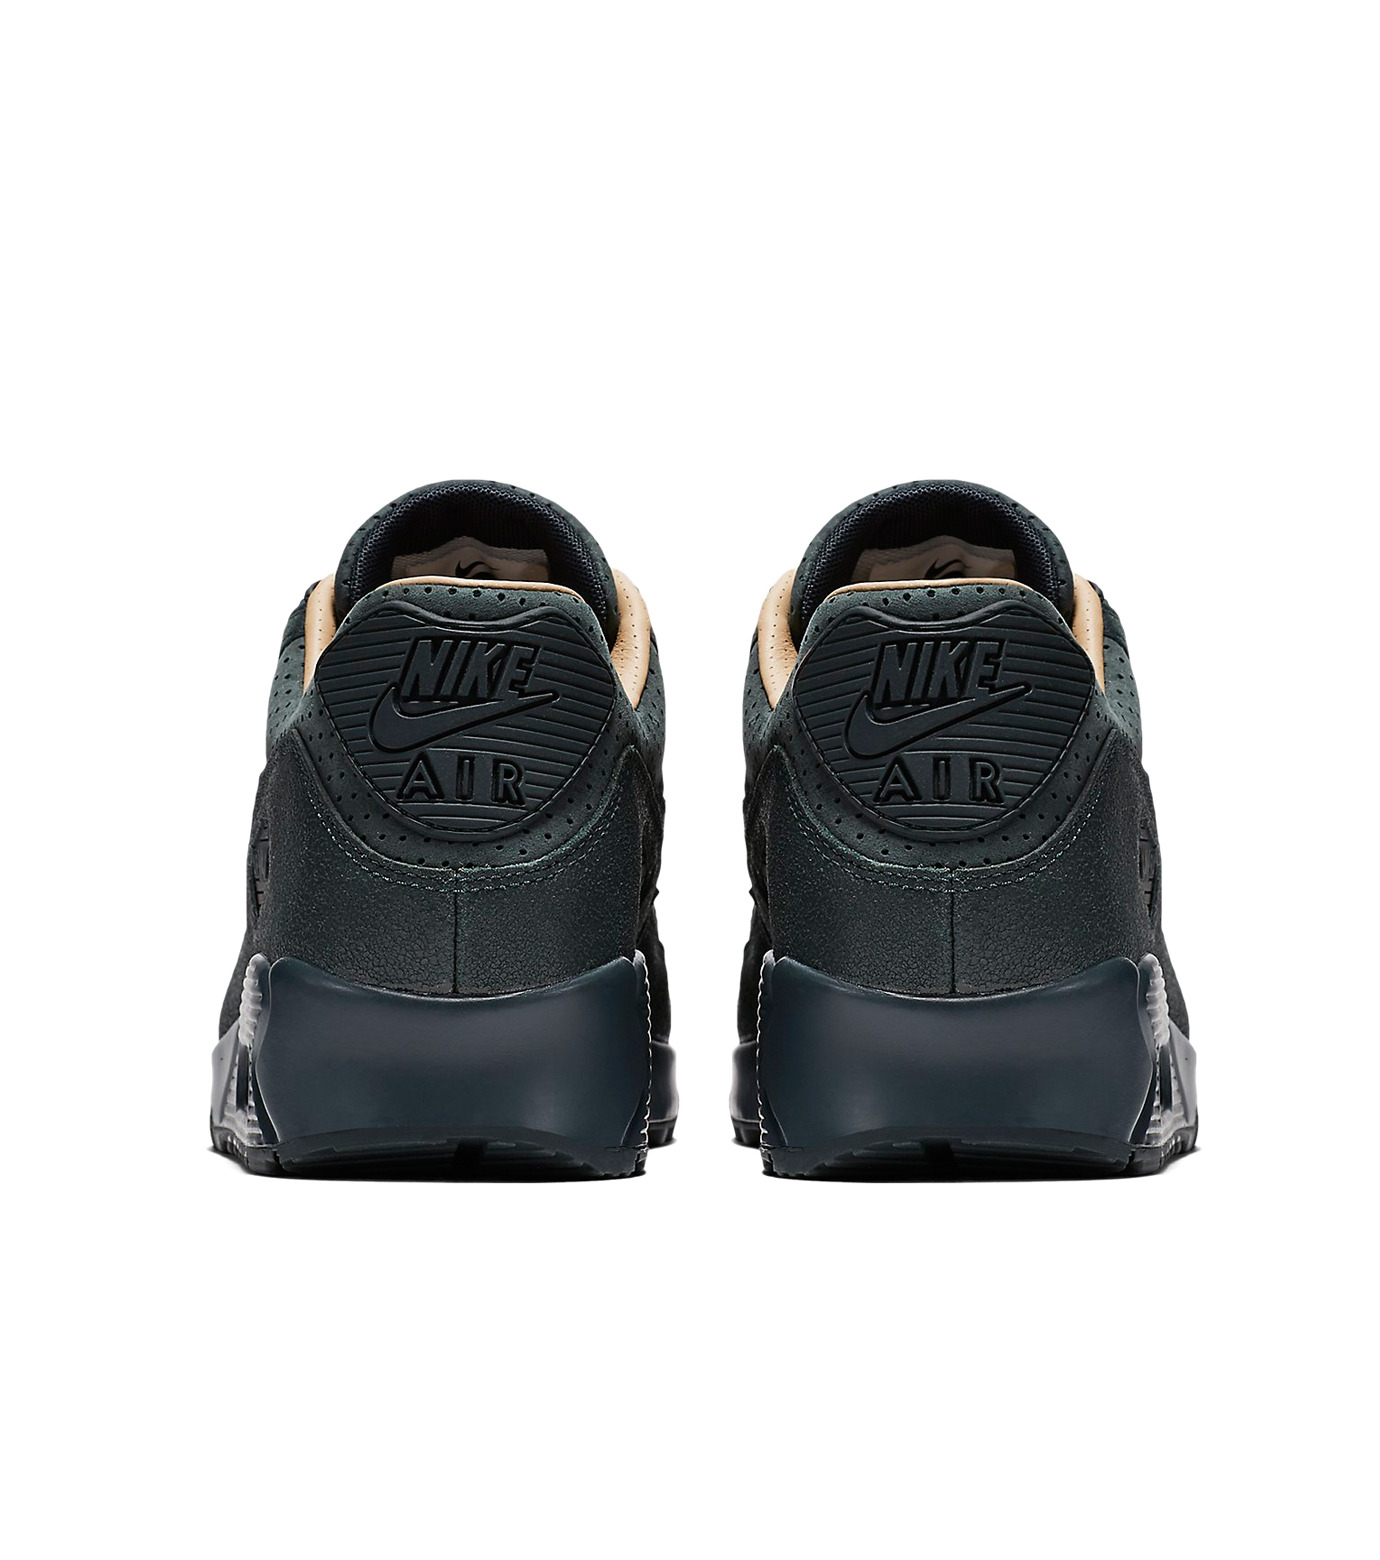 NIKE(ナイキ)のWMNS AIR MAX 90 PINNACLE-DARK GREEN(シューズ/shoes)-839612-301-23 拡大詳細画像5